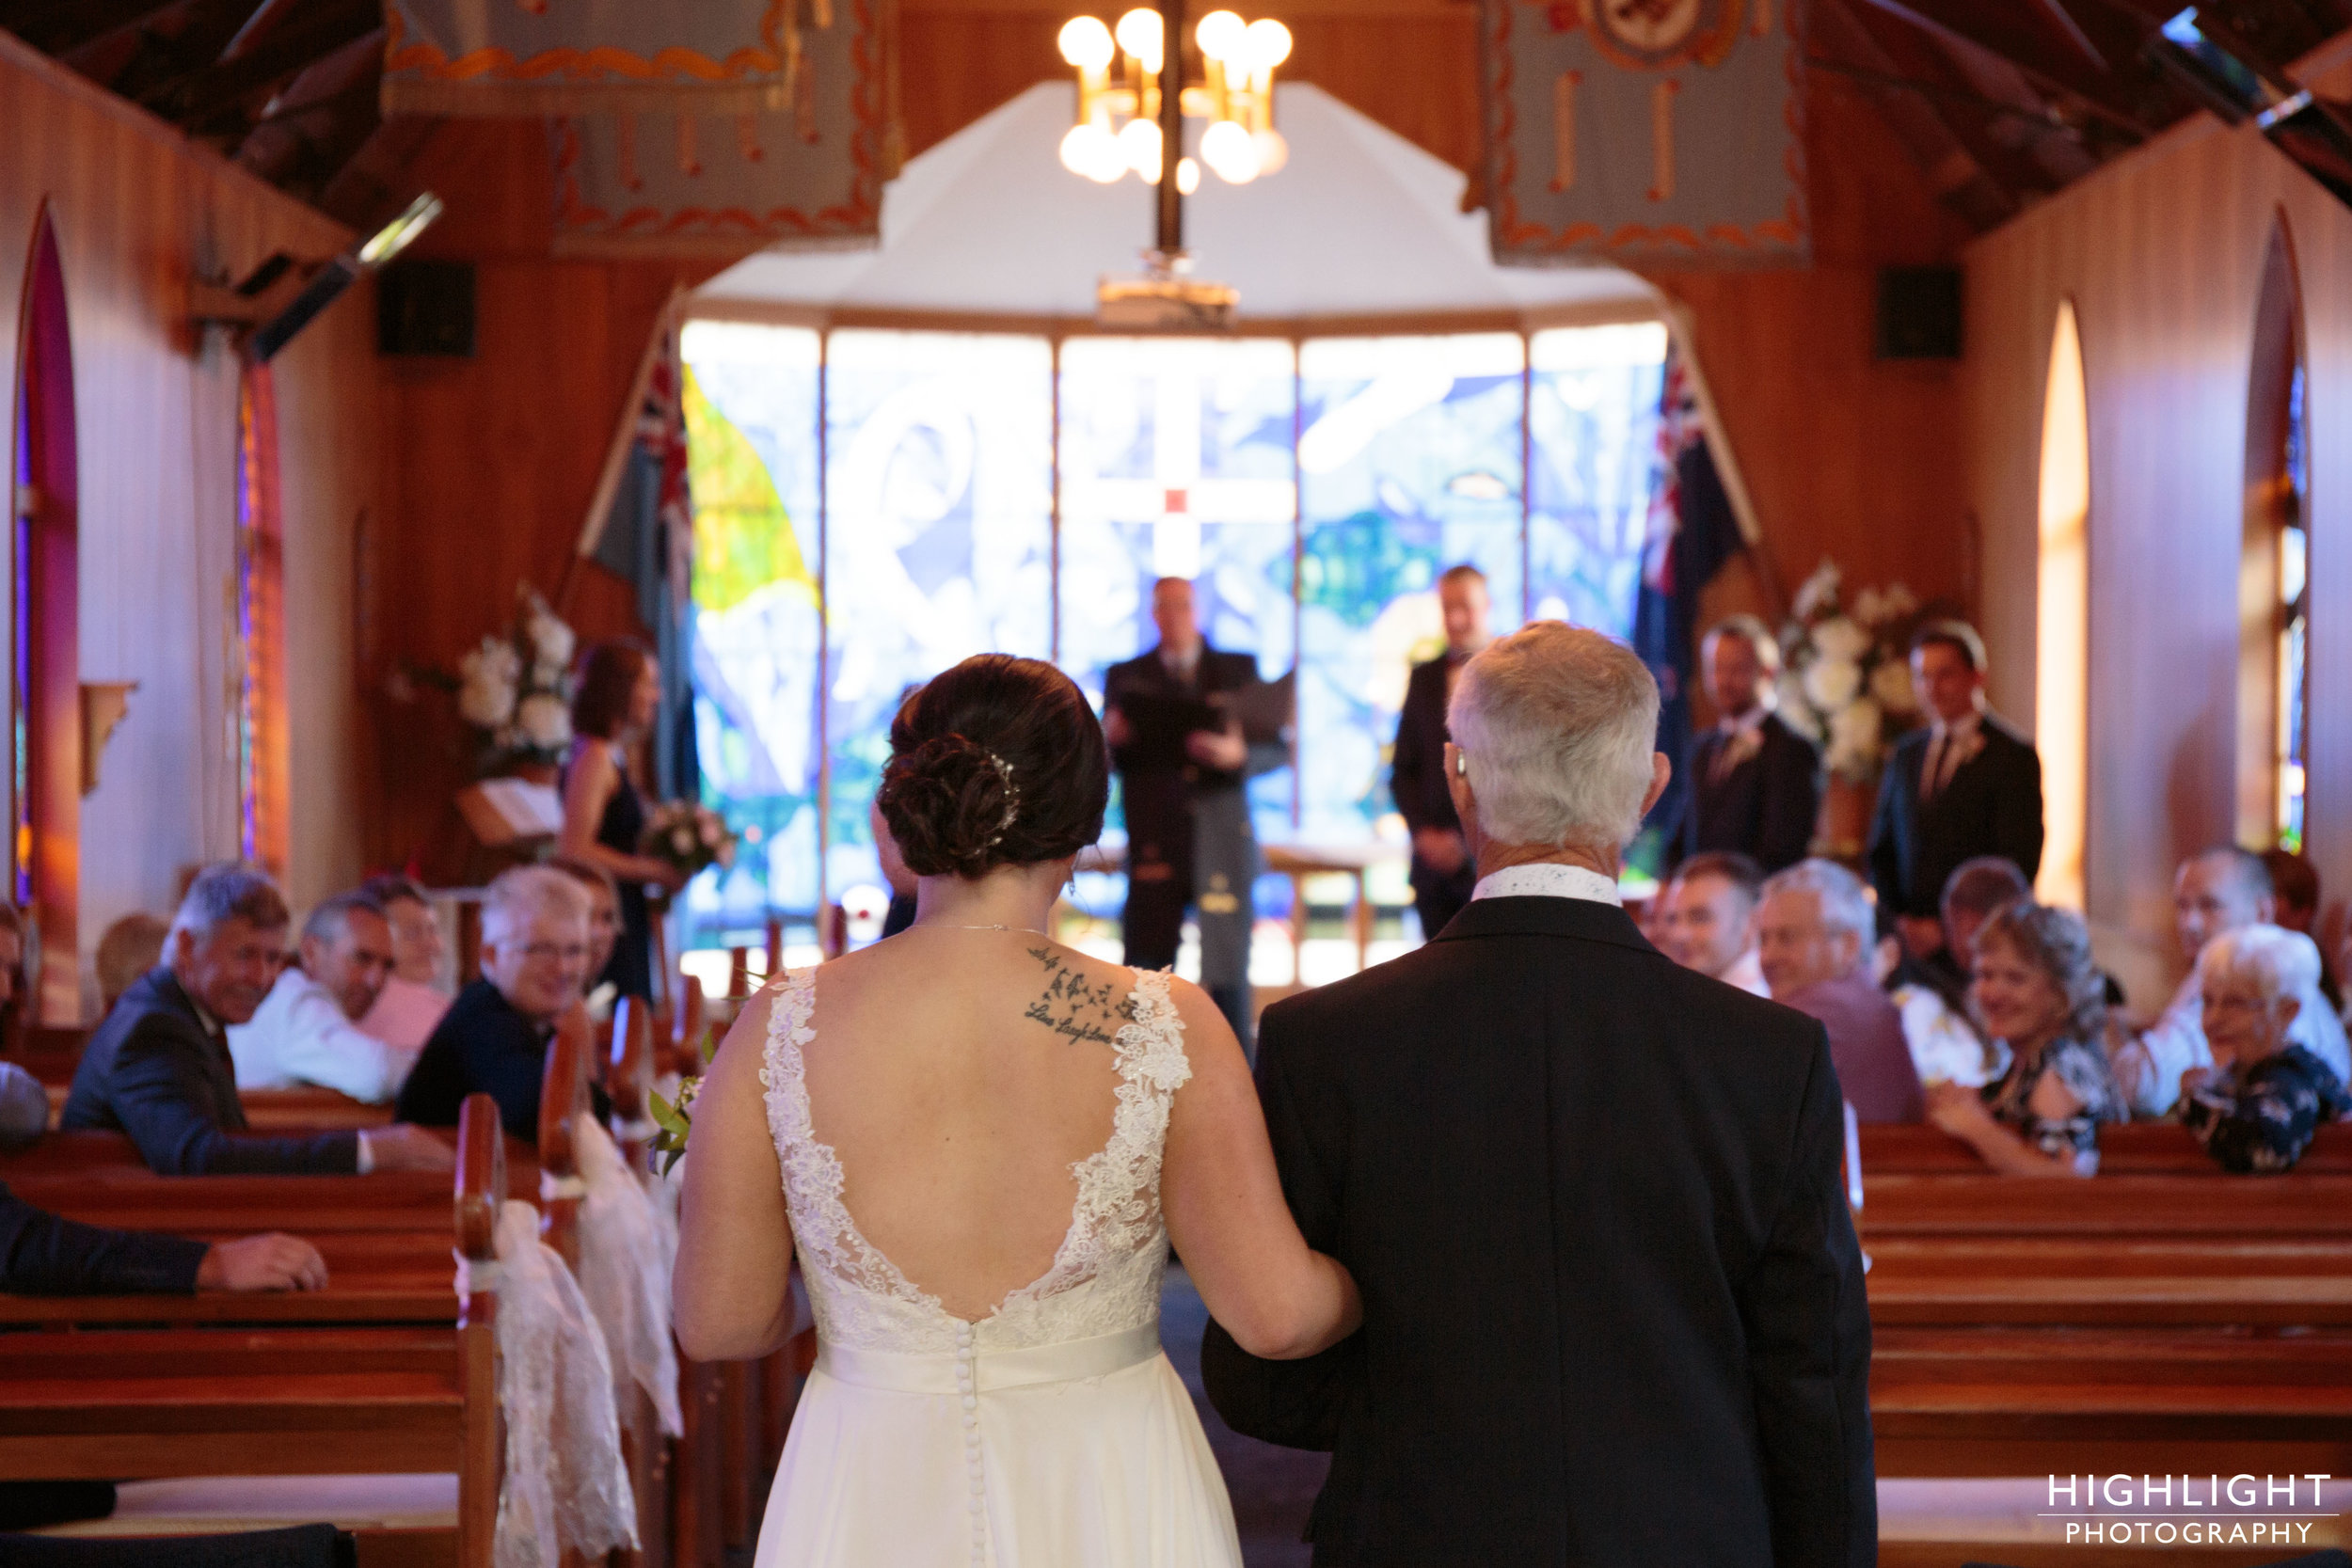 JM-2017-Highlight-wedding-photography-palmerston-north-new-zealand-47.jpg